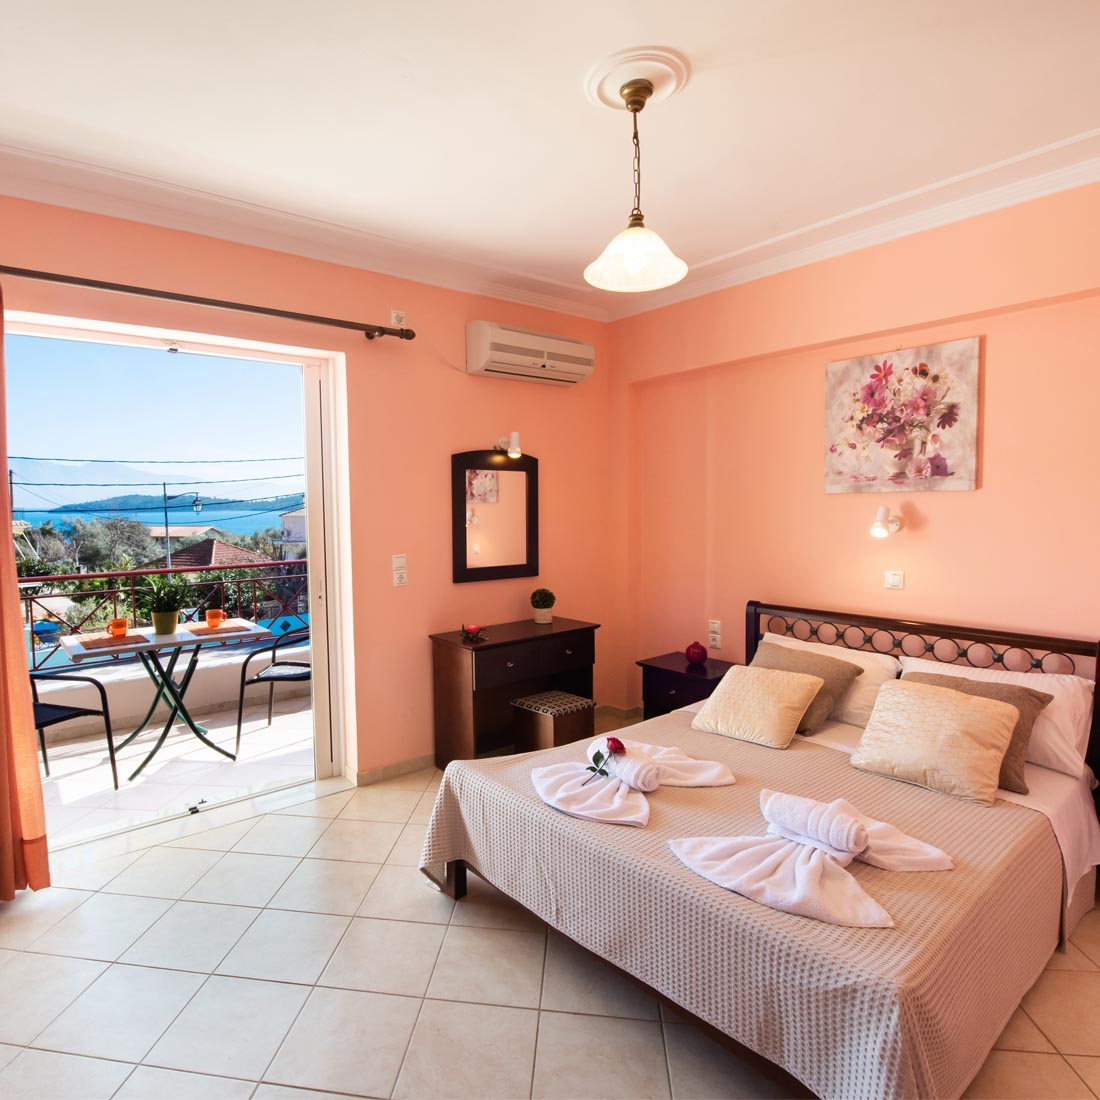 Sunrise Studios Lefkada Apartment Feature Image